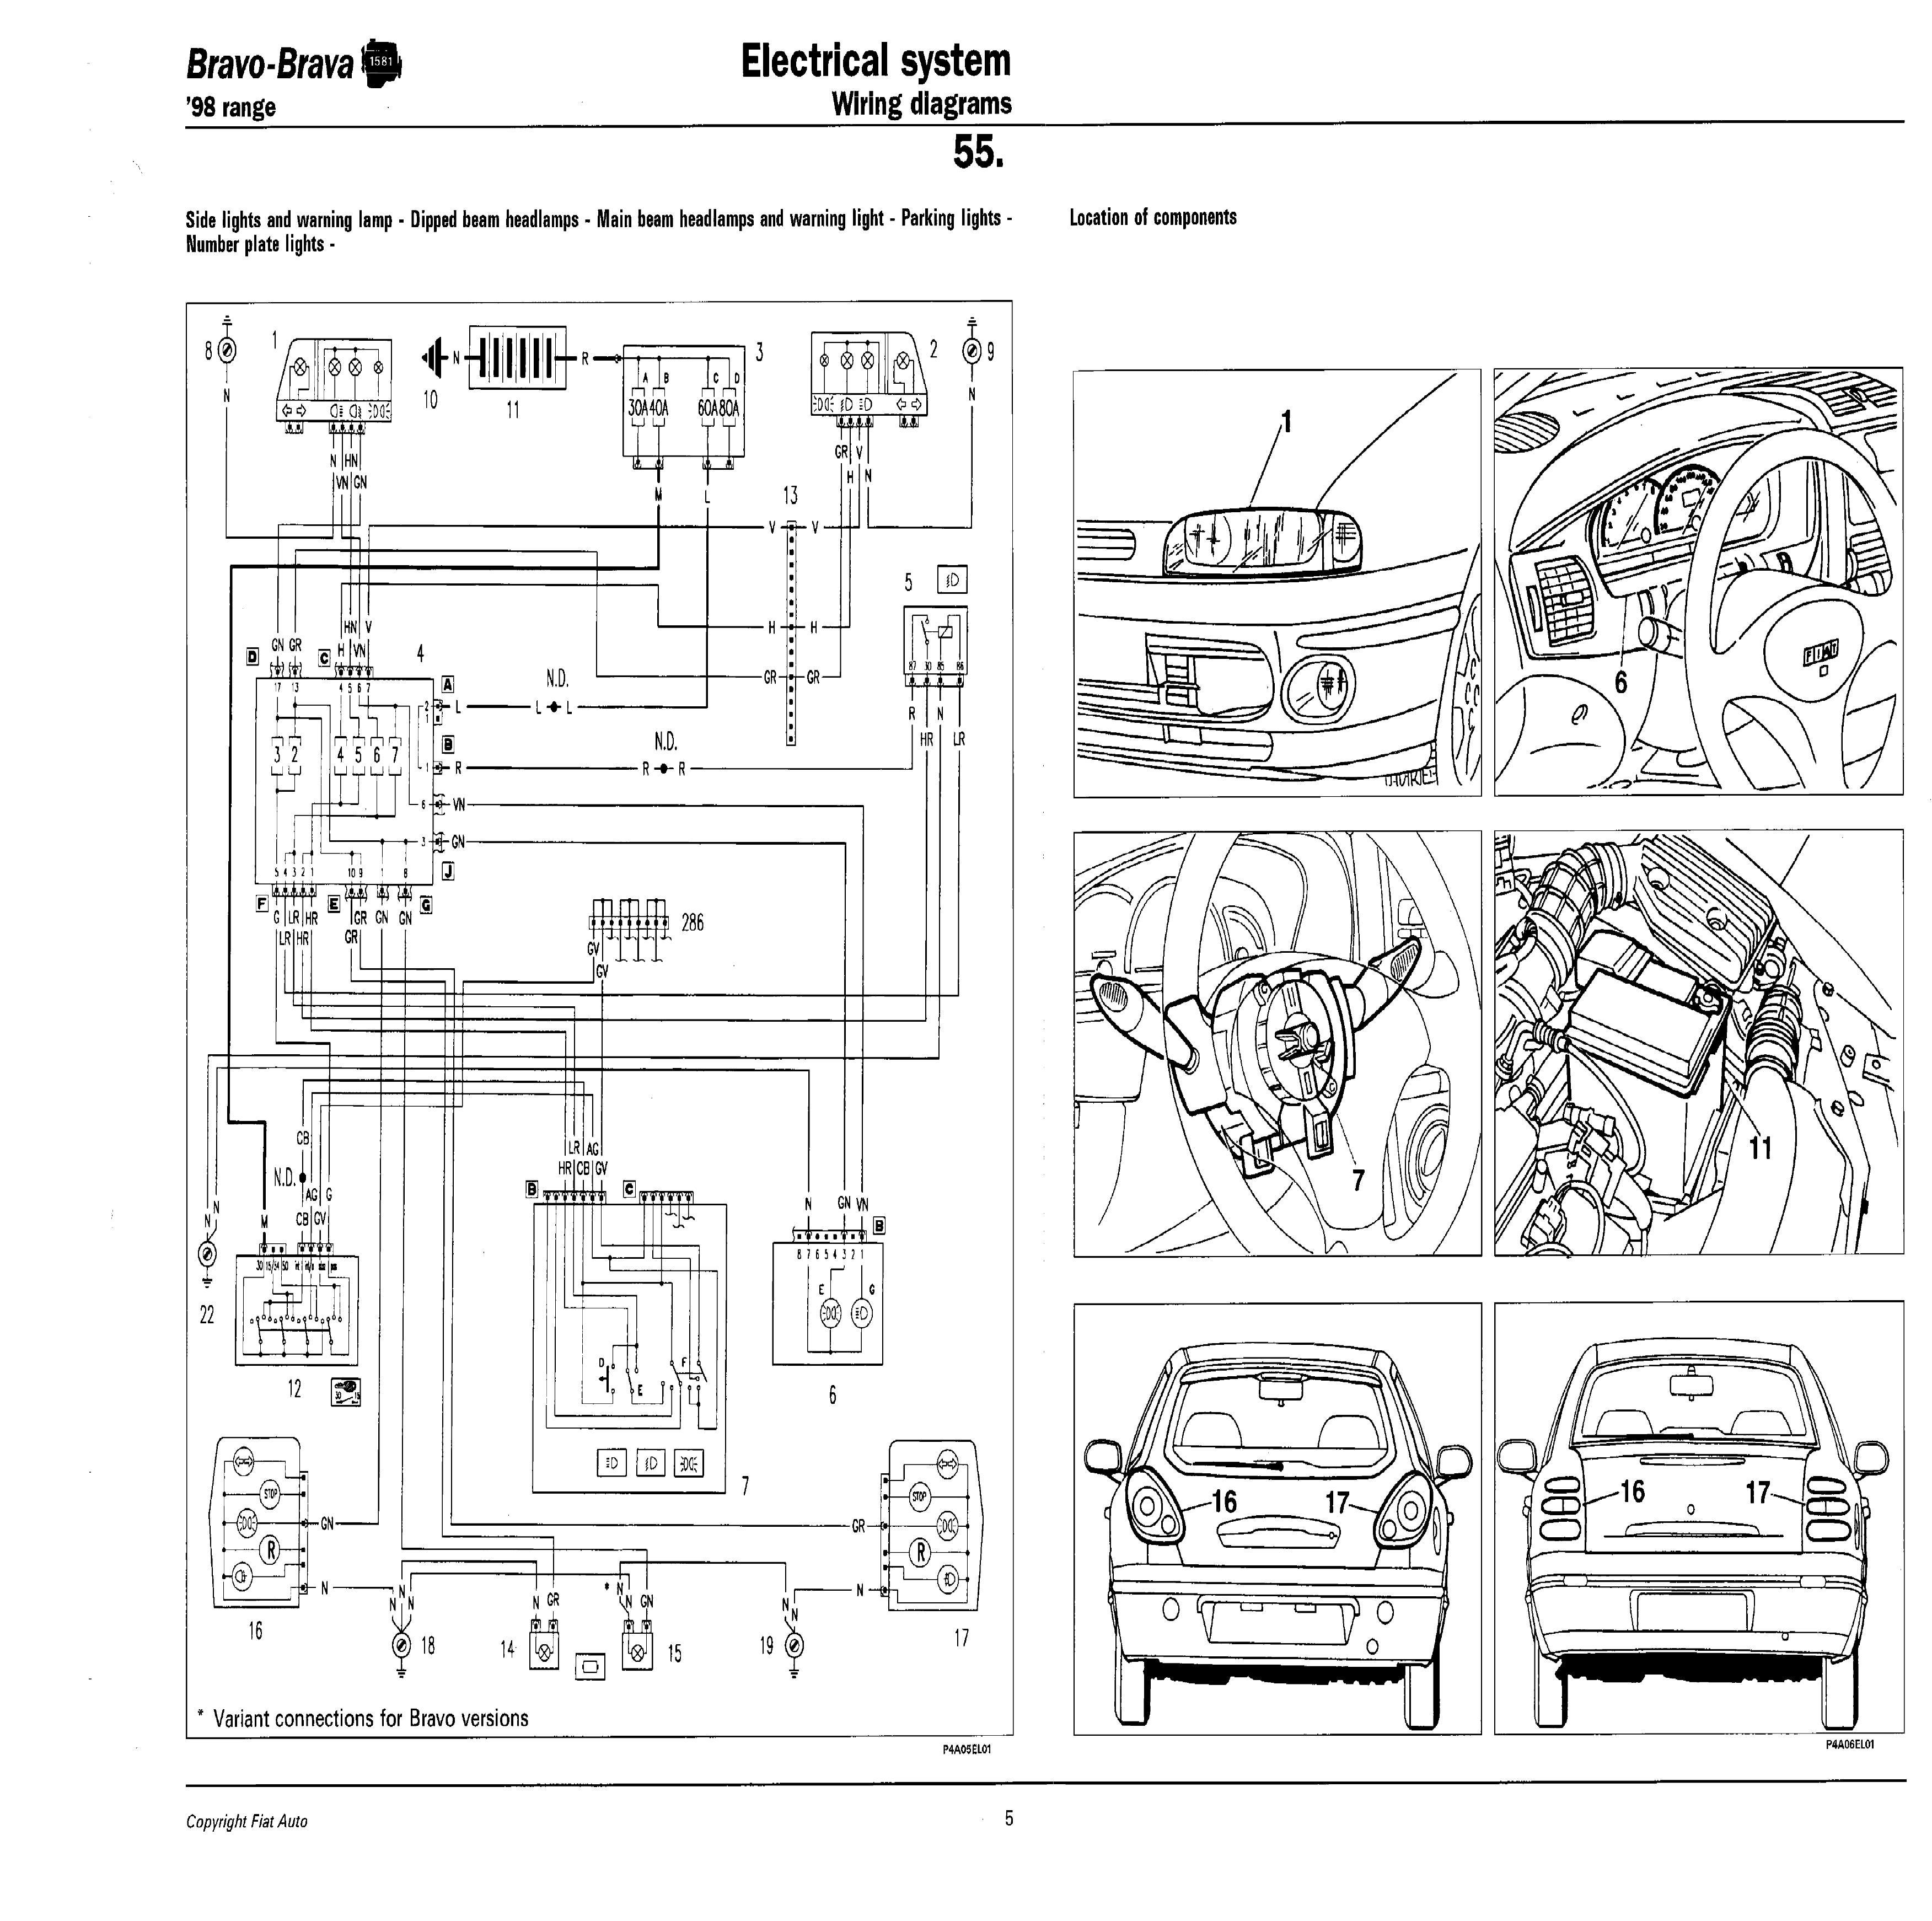 Outstanding Fiat Bravo Fuse Box Layout Basic Electronics Wiring Diagram Wiring Cloud Ittabisraaidewilluminateatxorg